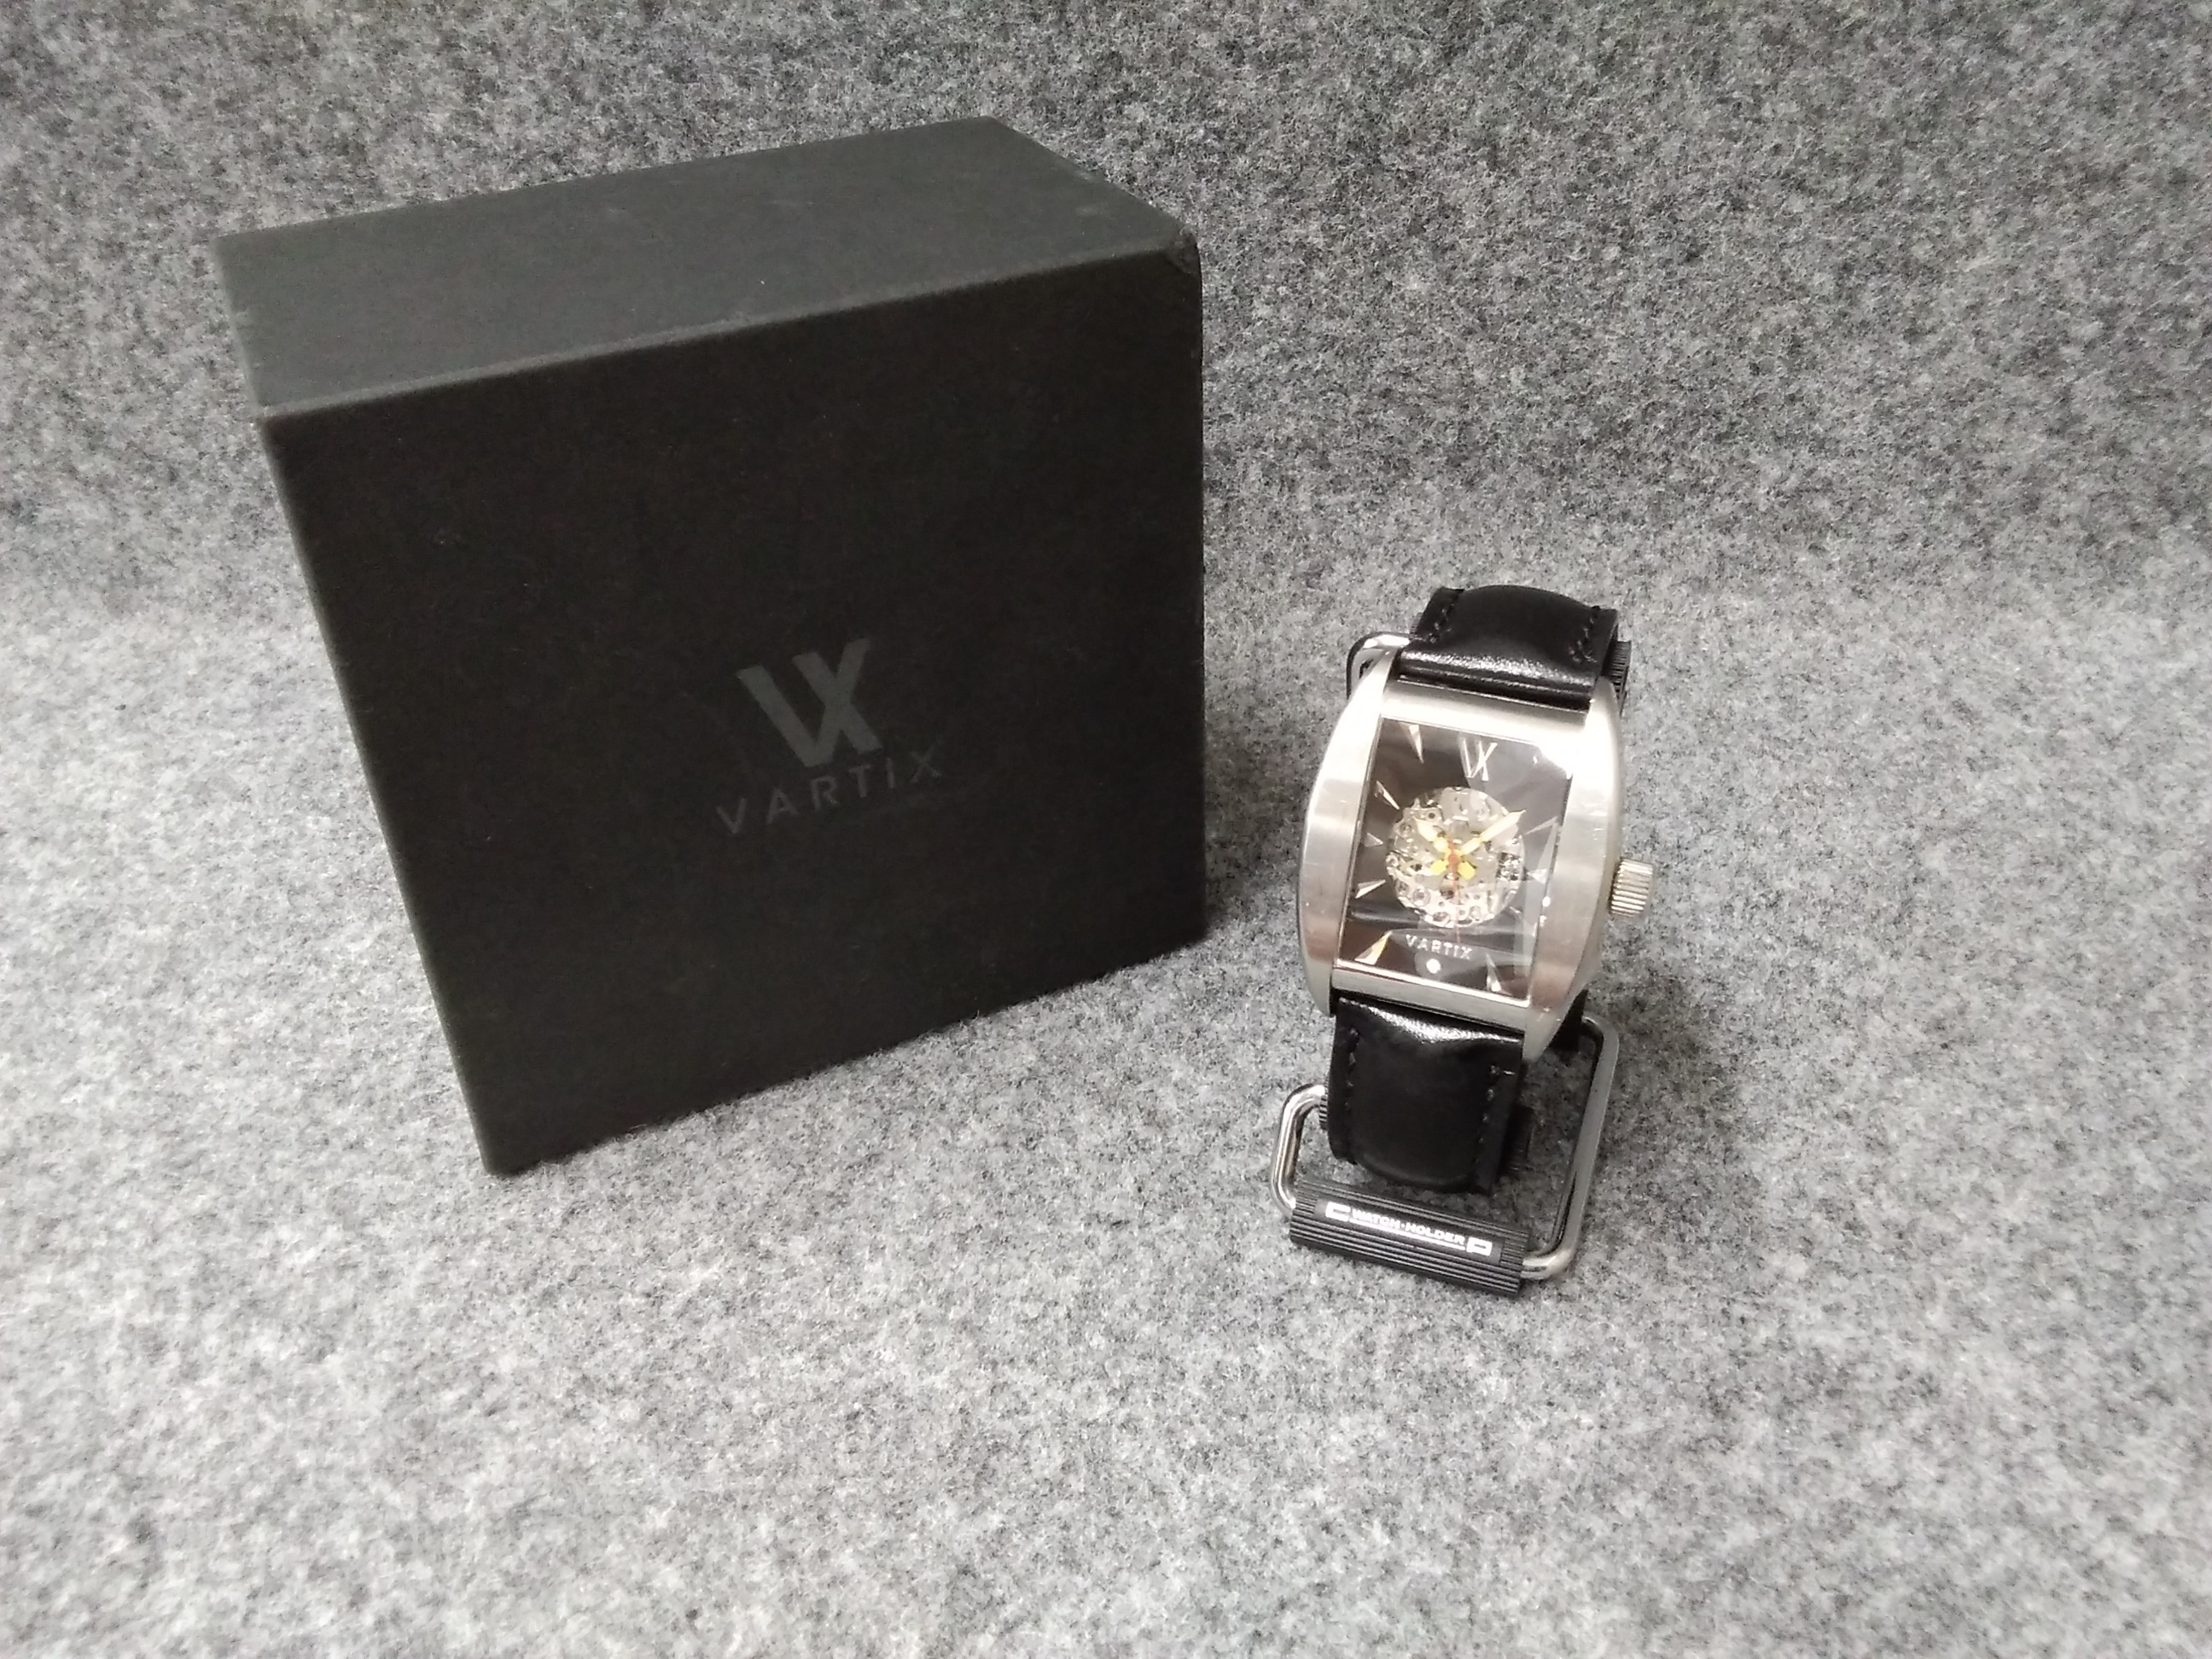 自動巻き腕時計|VARTIX